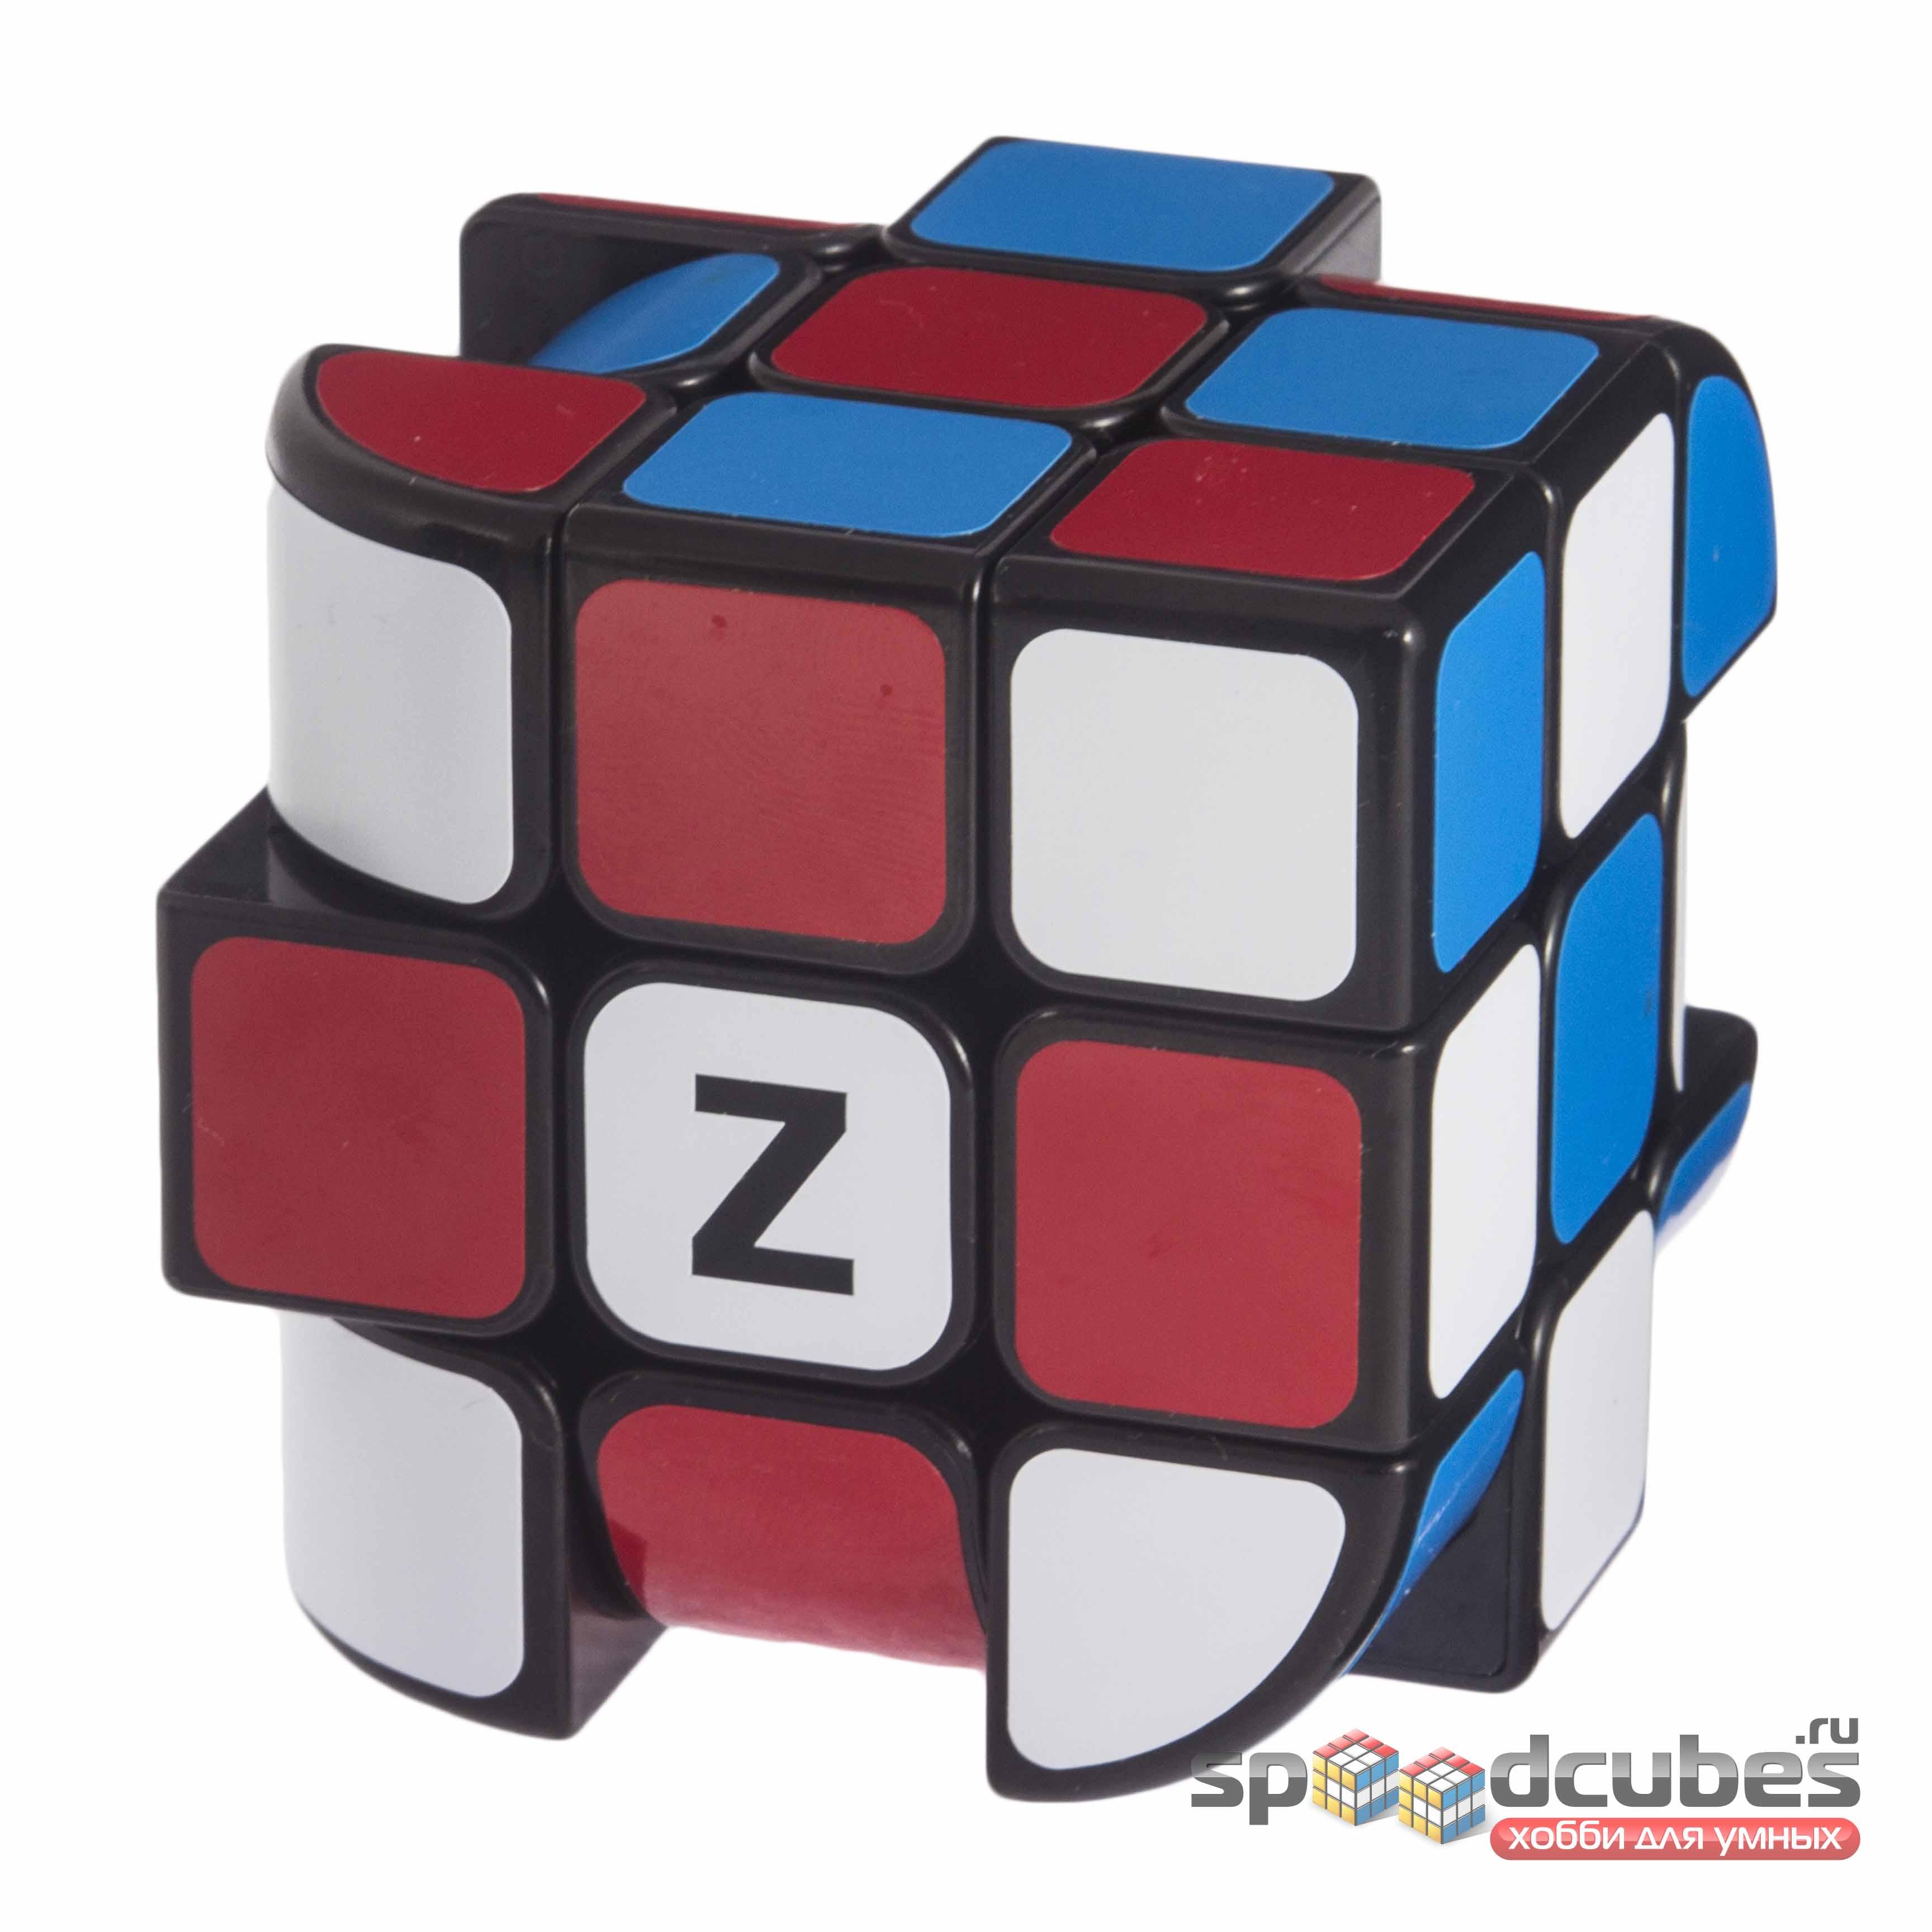 Z 3x3x3 Penrose Black 2